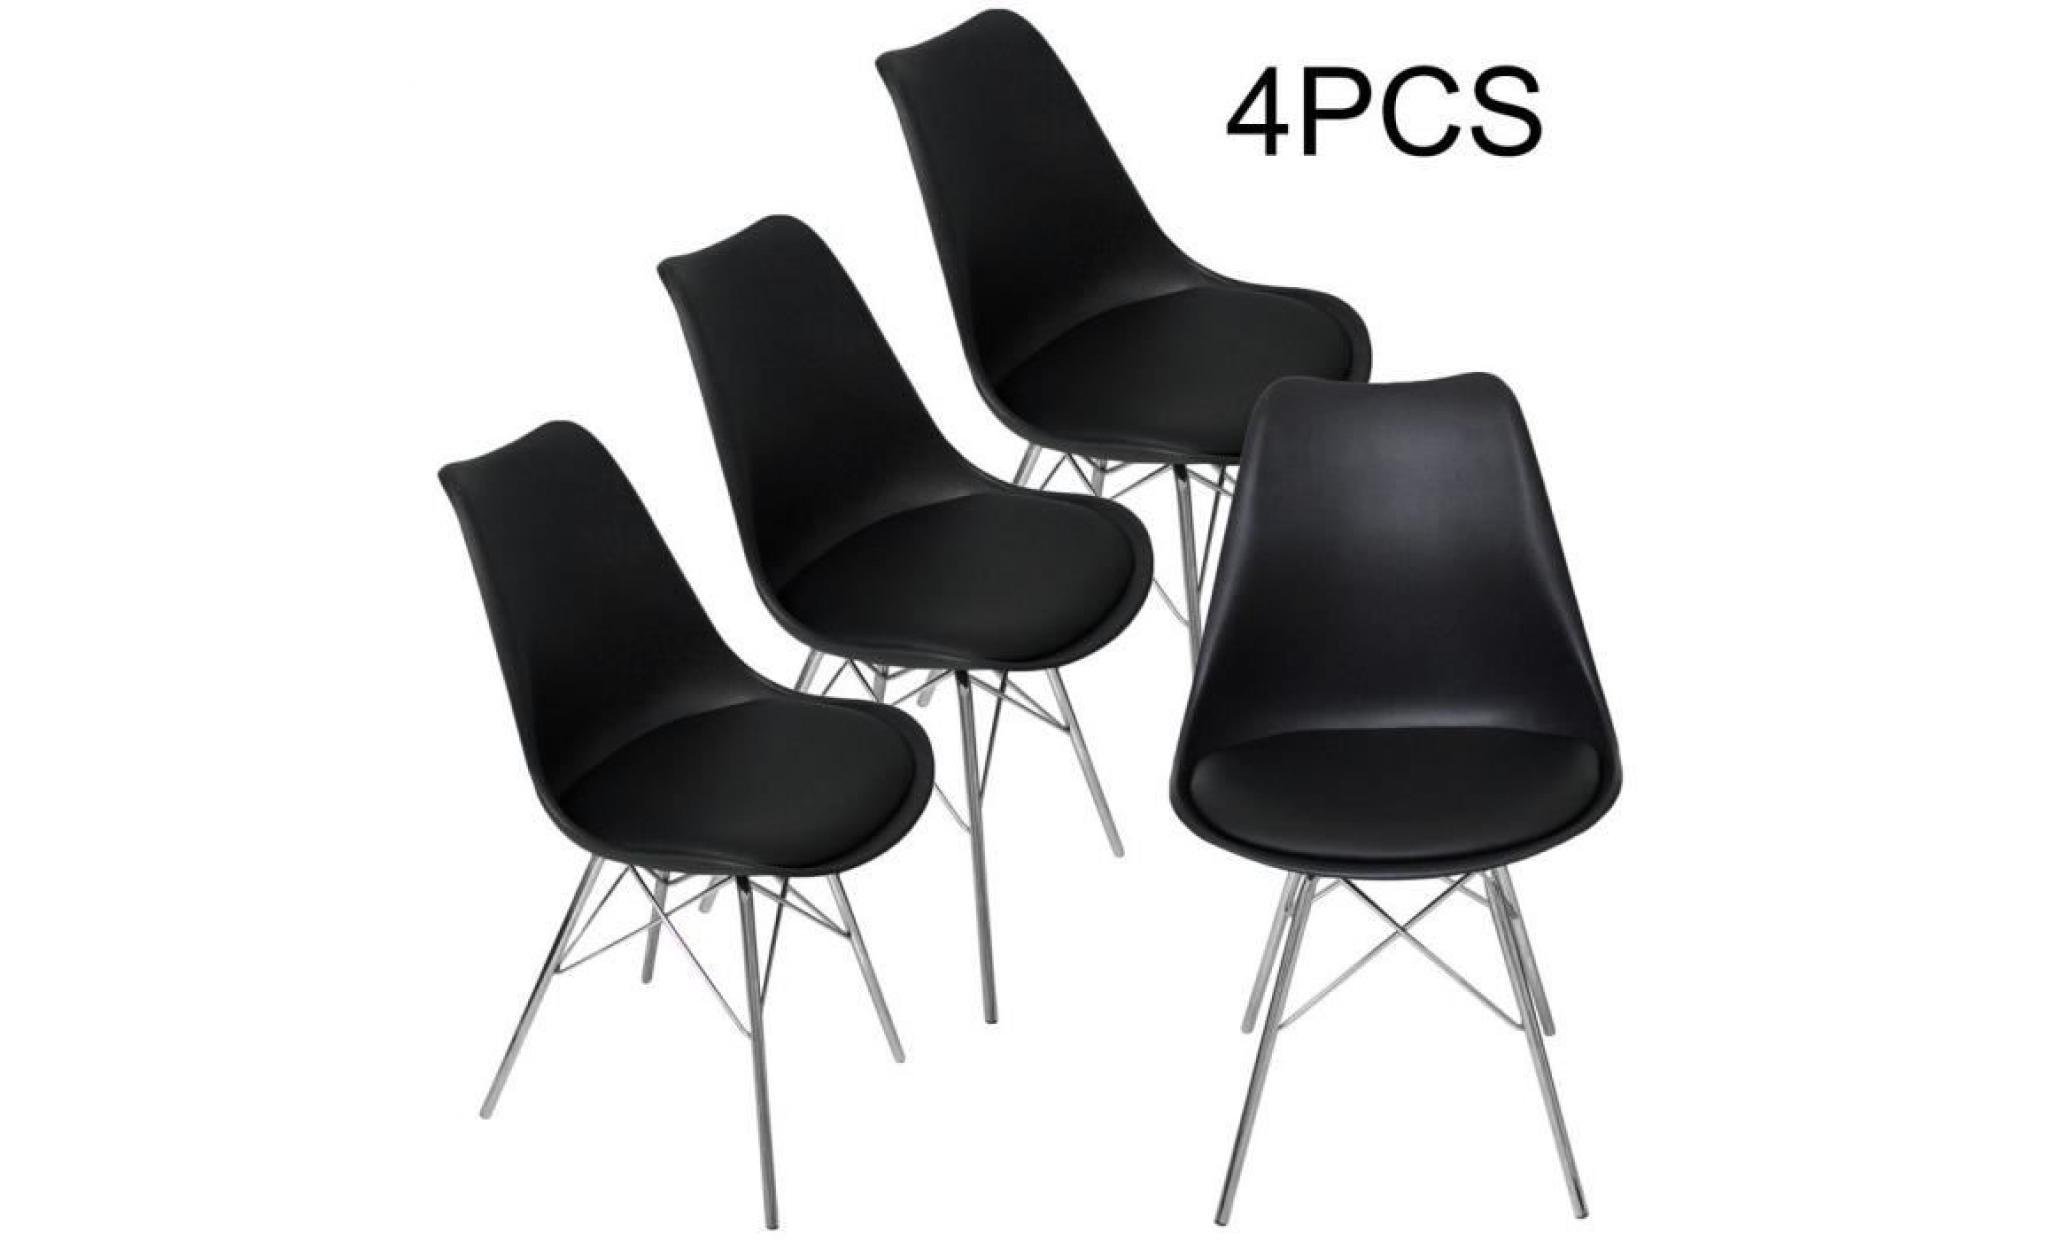 Manger Salle Scandinave Style Chaises À zMpqSUVG